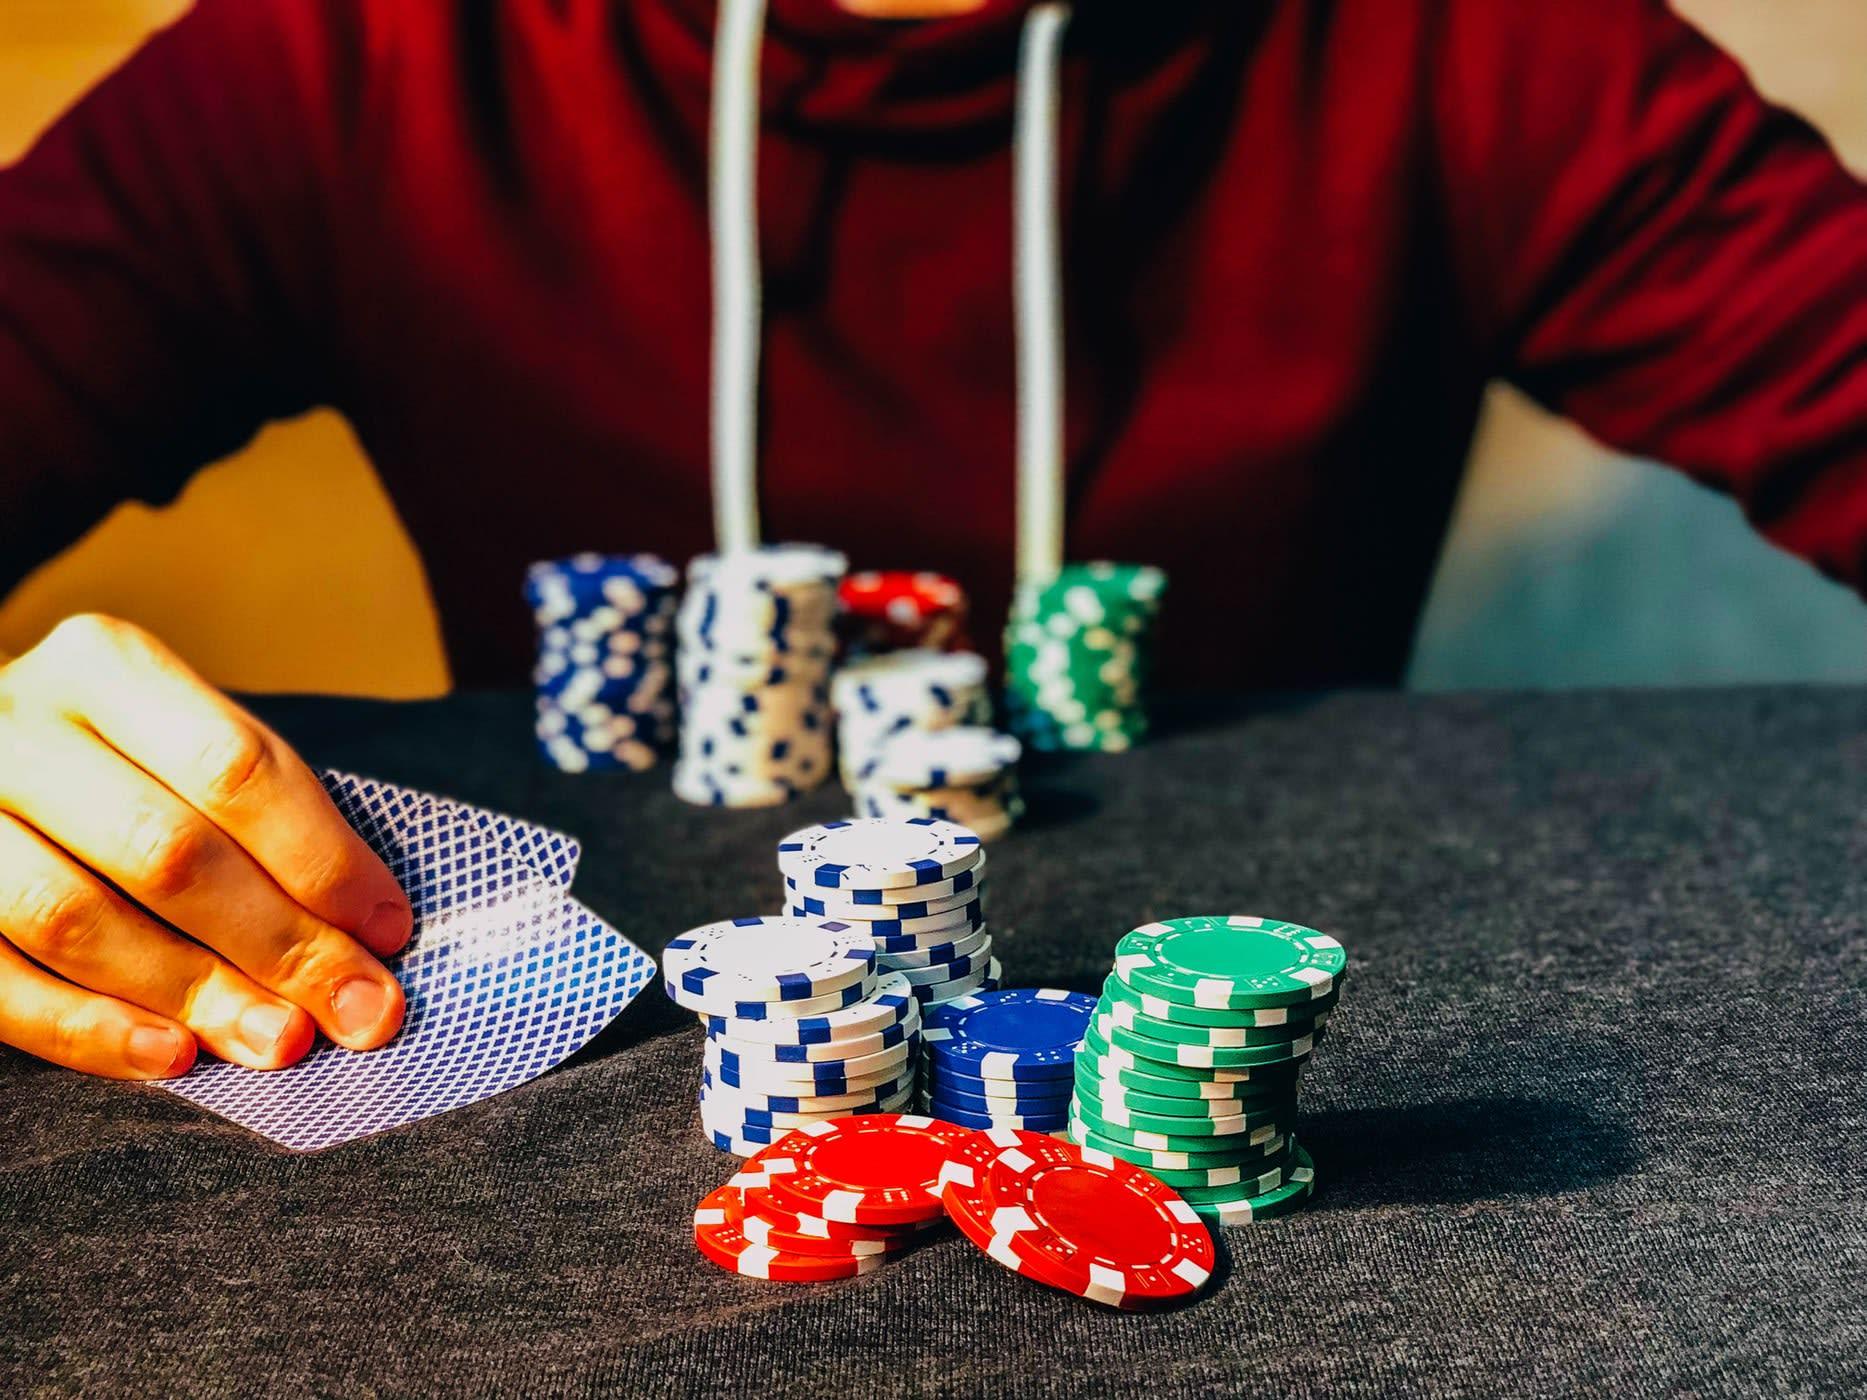 Pragmatic Play Memperluas Perjanjian Betway untuk Menyertakan Permainan Dealer Langsung